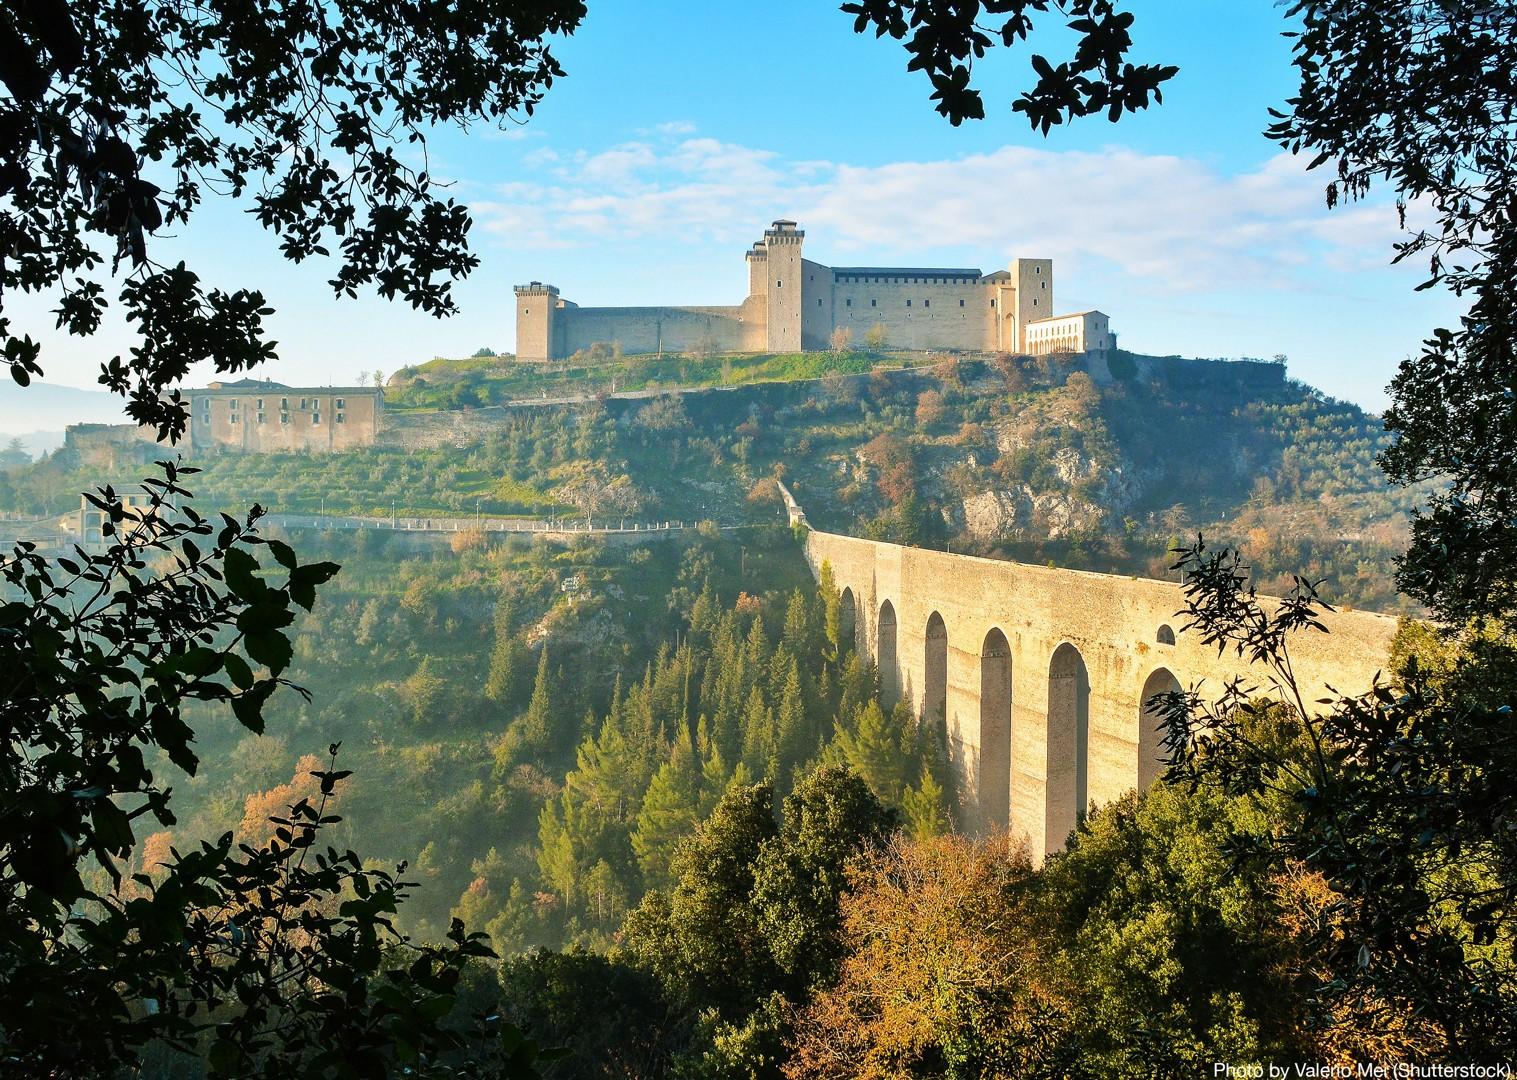 spoleto-family-cycling-holiday-in-italy.jpg - Italy - Spirit of Umbria - Family Cycling